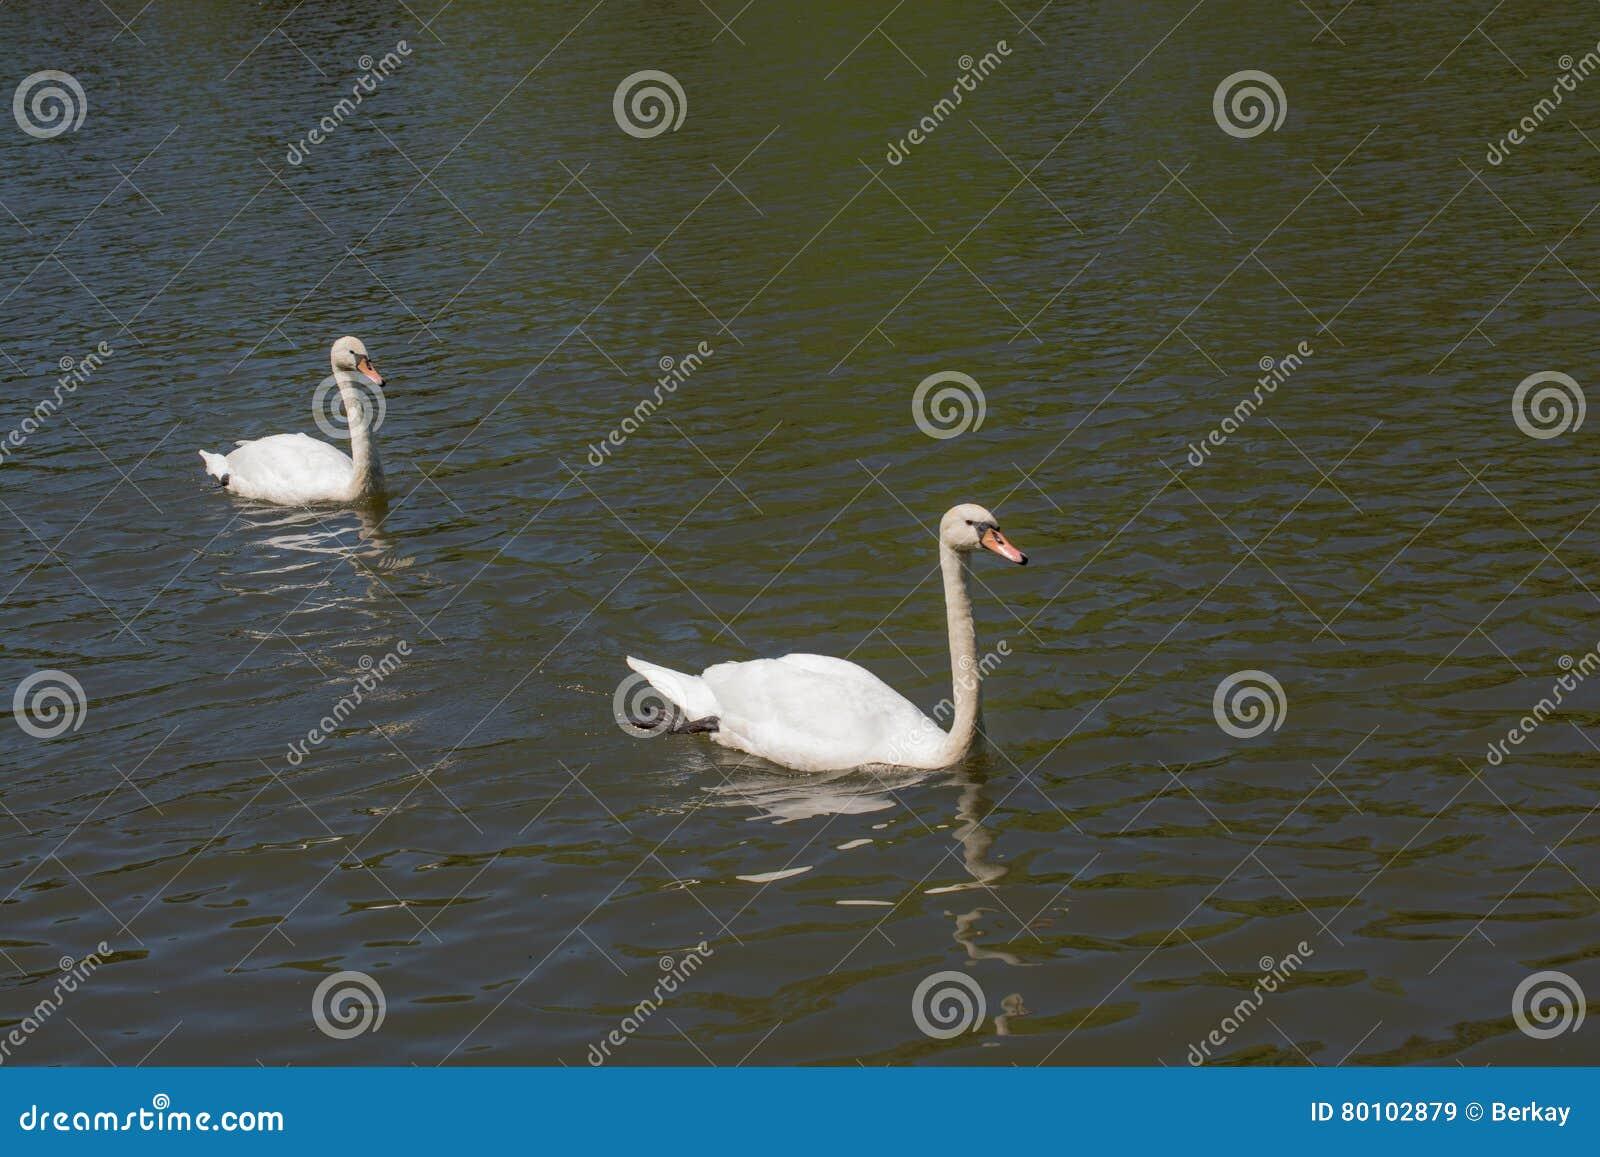 As cisnes sós vivem no ambiente natural